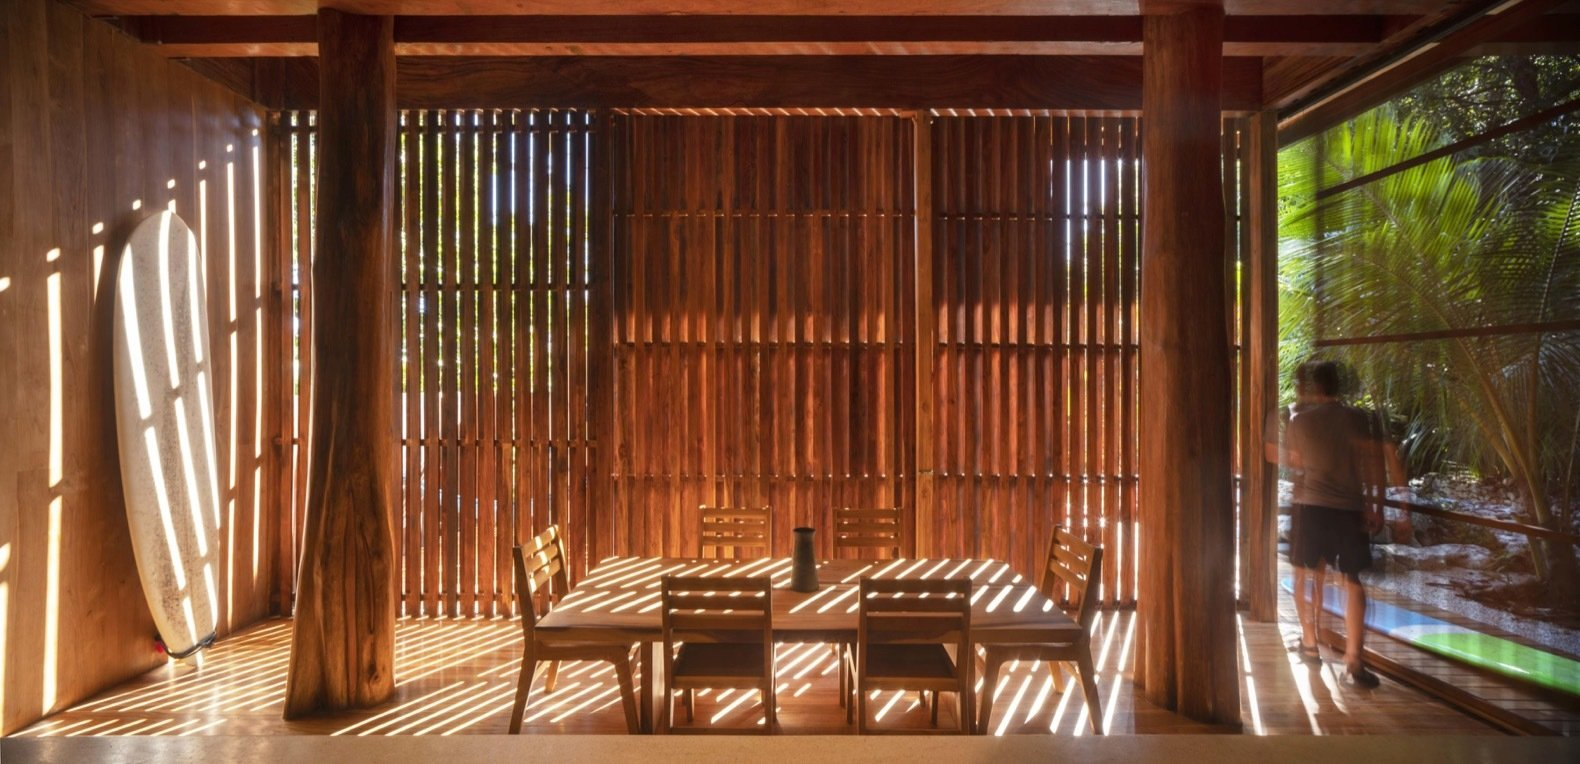 Costa Rica Tree House dining room